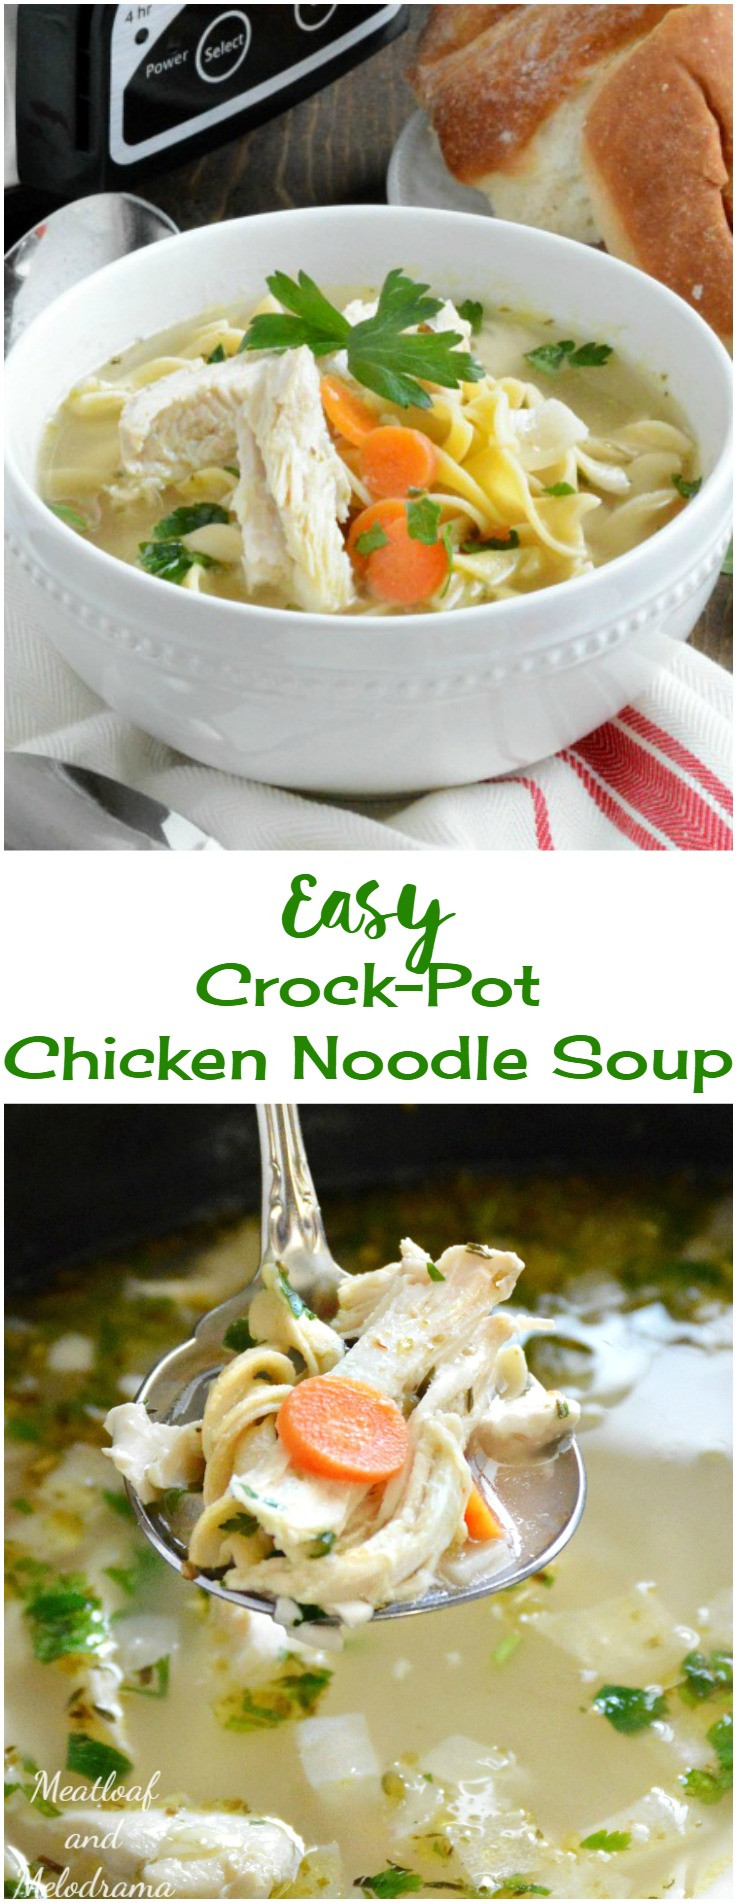 Chicken Noodle Soup In Crock Pot  Easy Crock Pot Chicken Noodle Soup Meatloaf and Melodrama